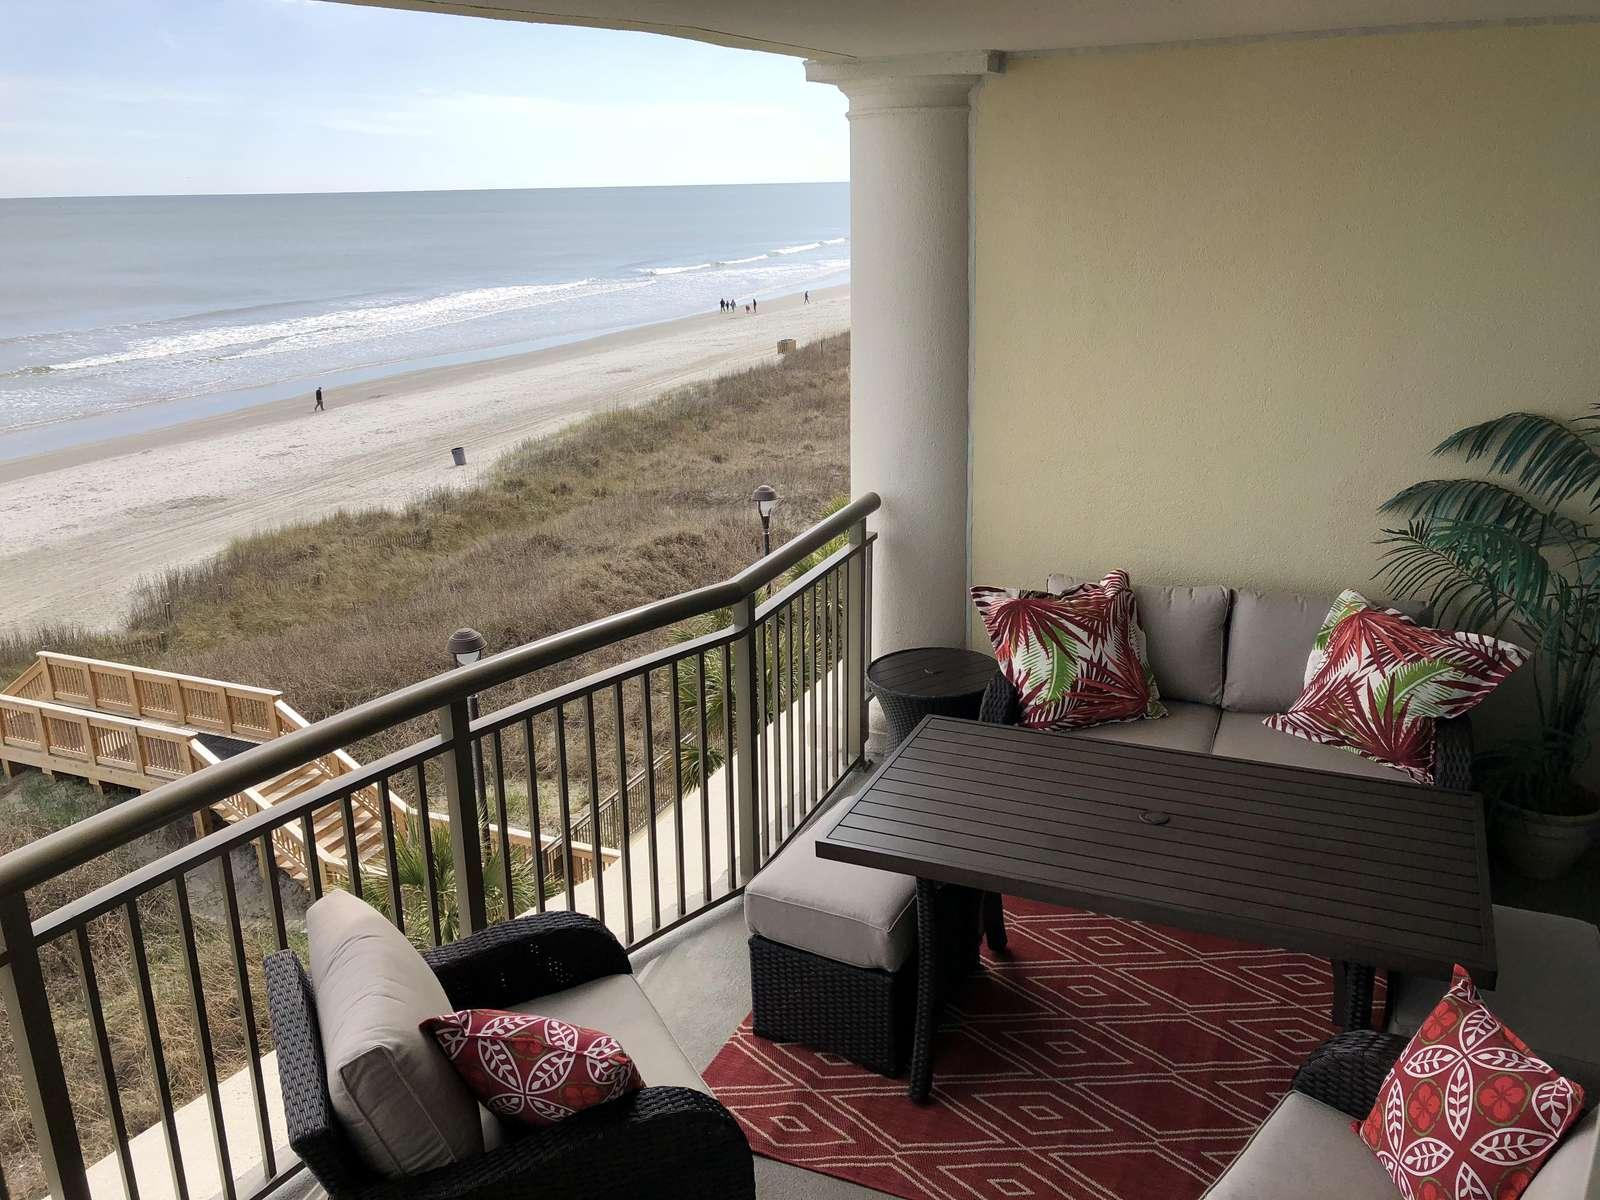 Beautiful new balcony furniture